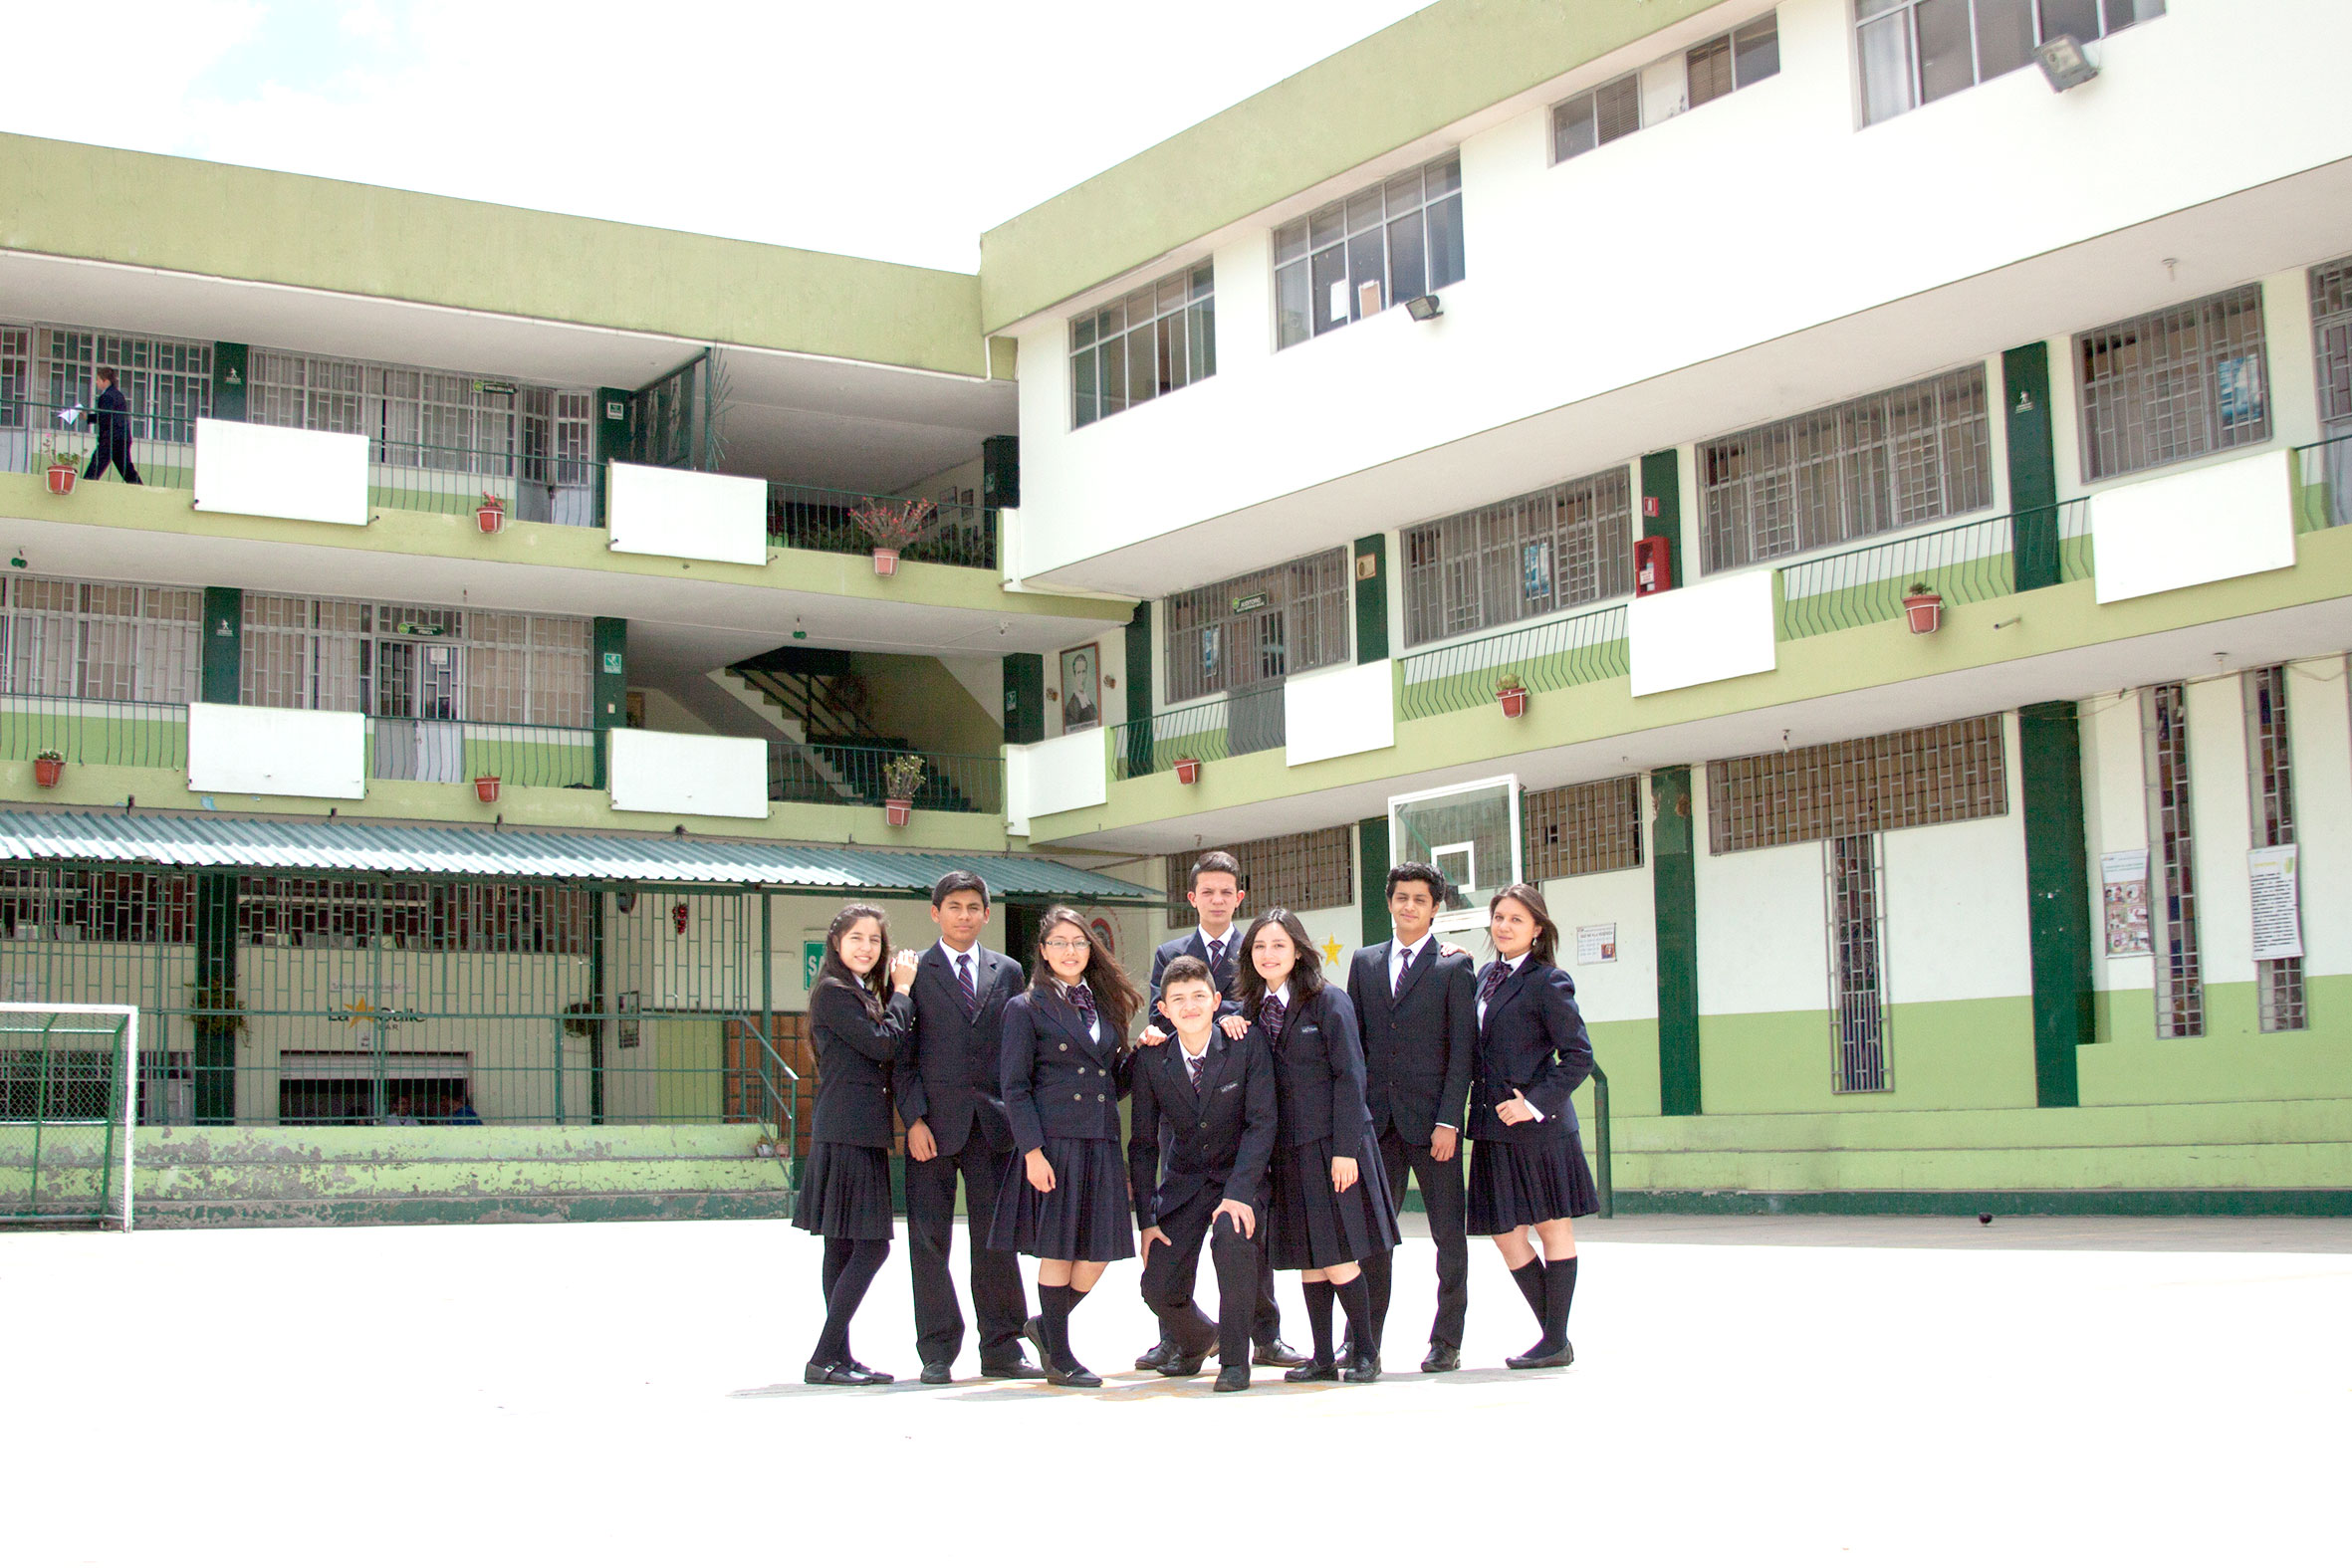 Campus La Salle de Azogues